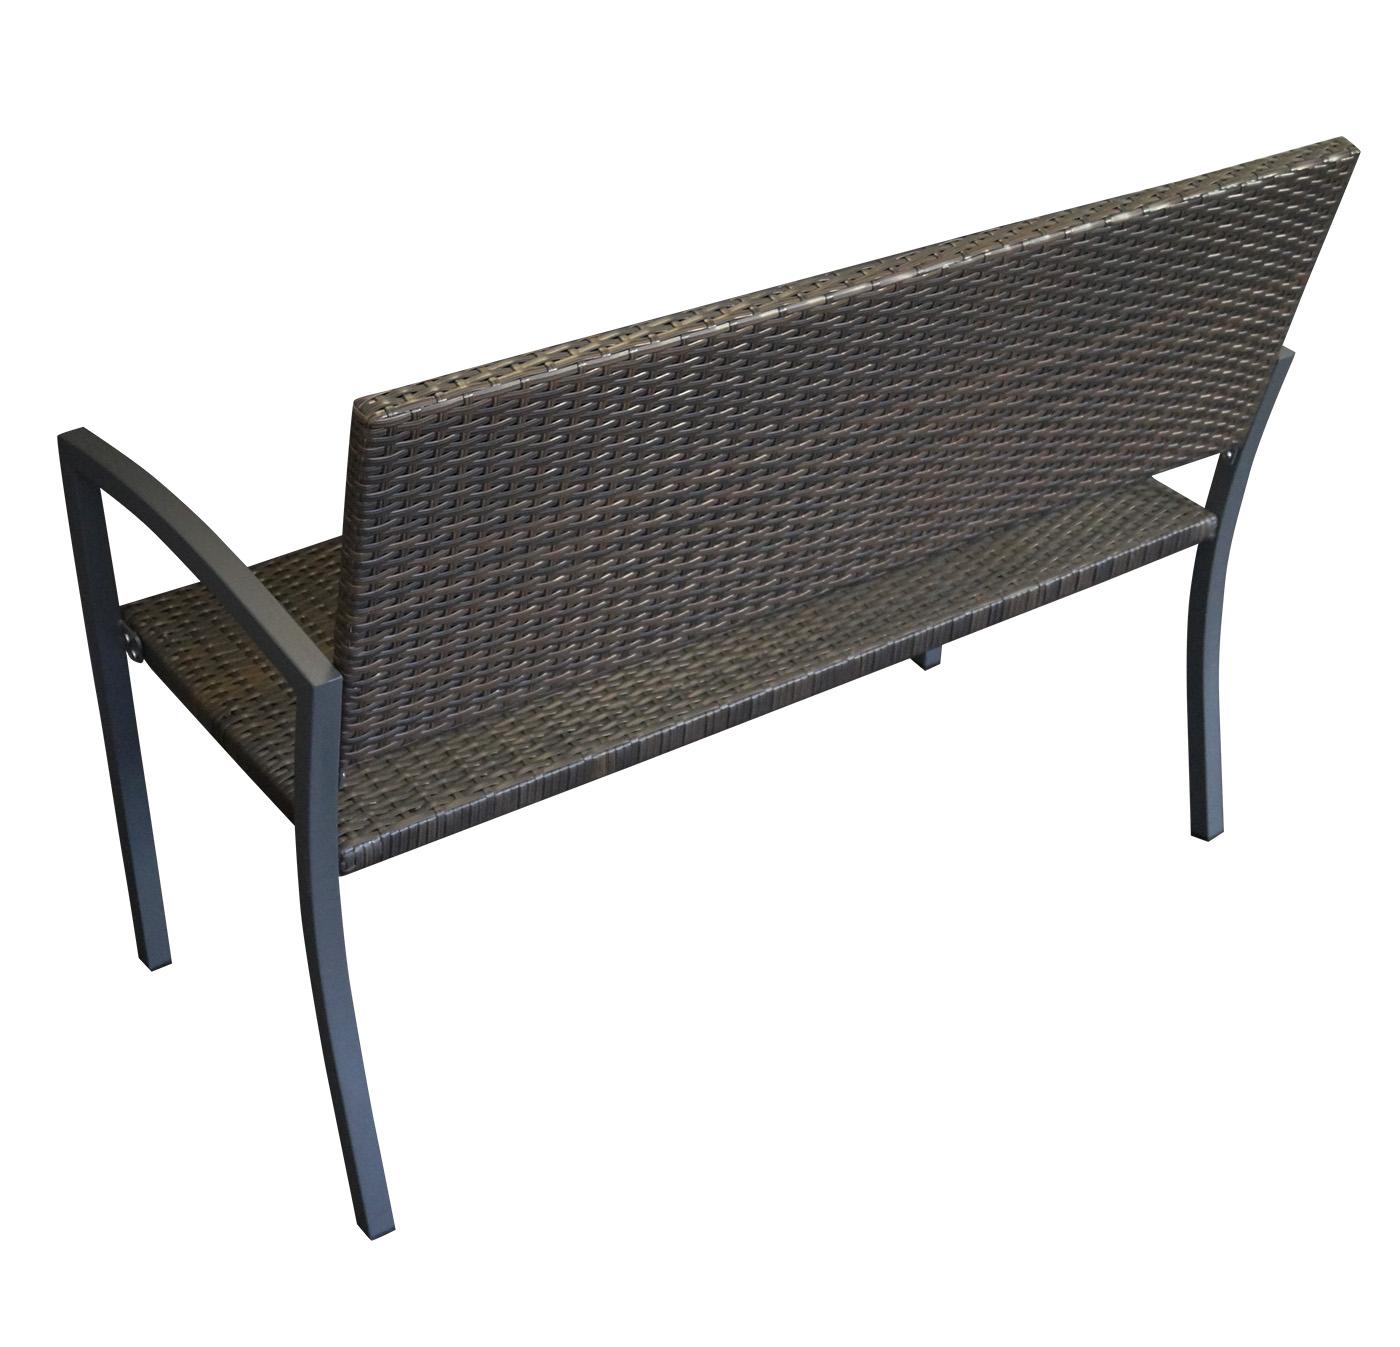 gartenbank rattanbank gartenm bel bank toledo stahl rattan geflecht braunn ebay. Black Bedroom Furniture Sets. Home Design Ideas